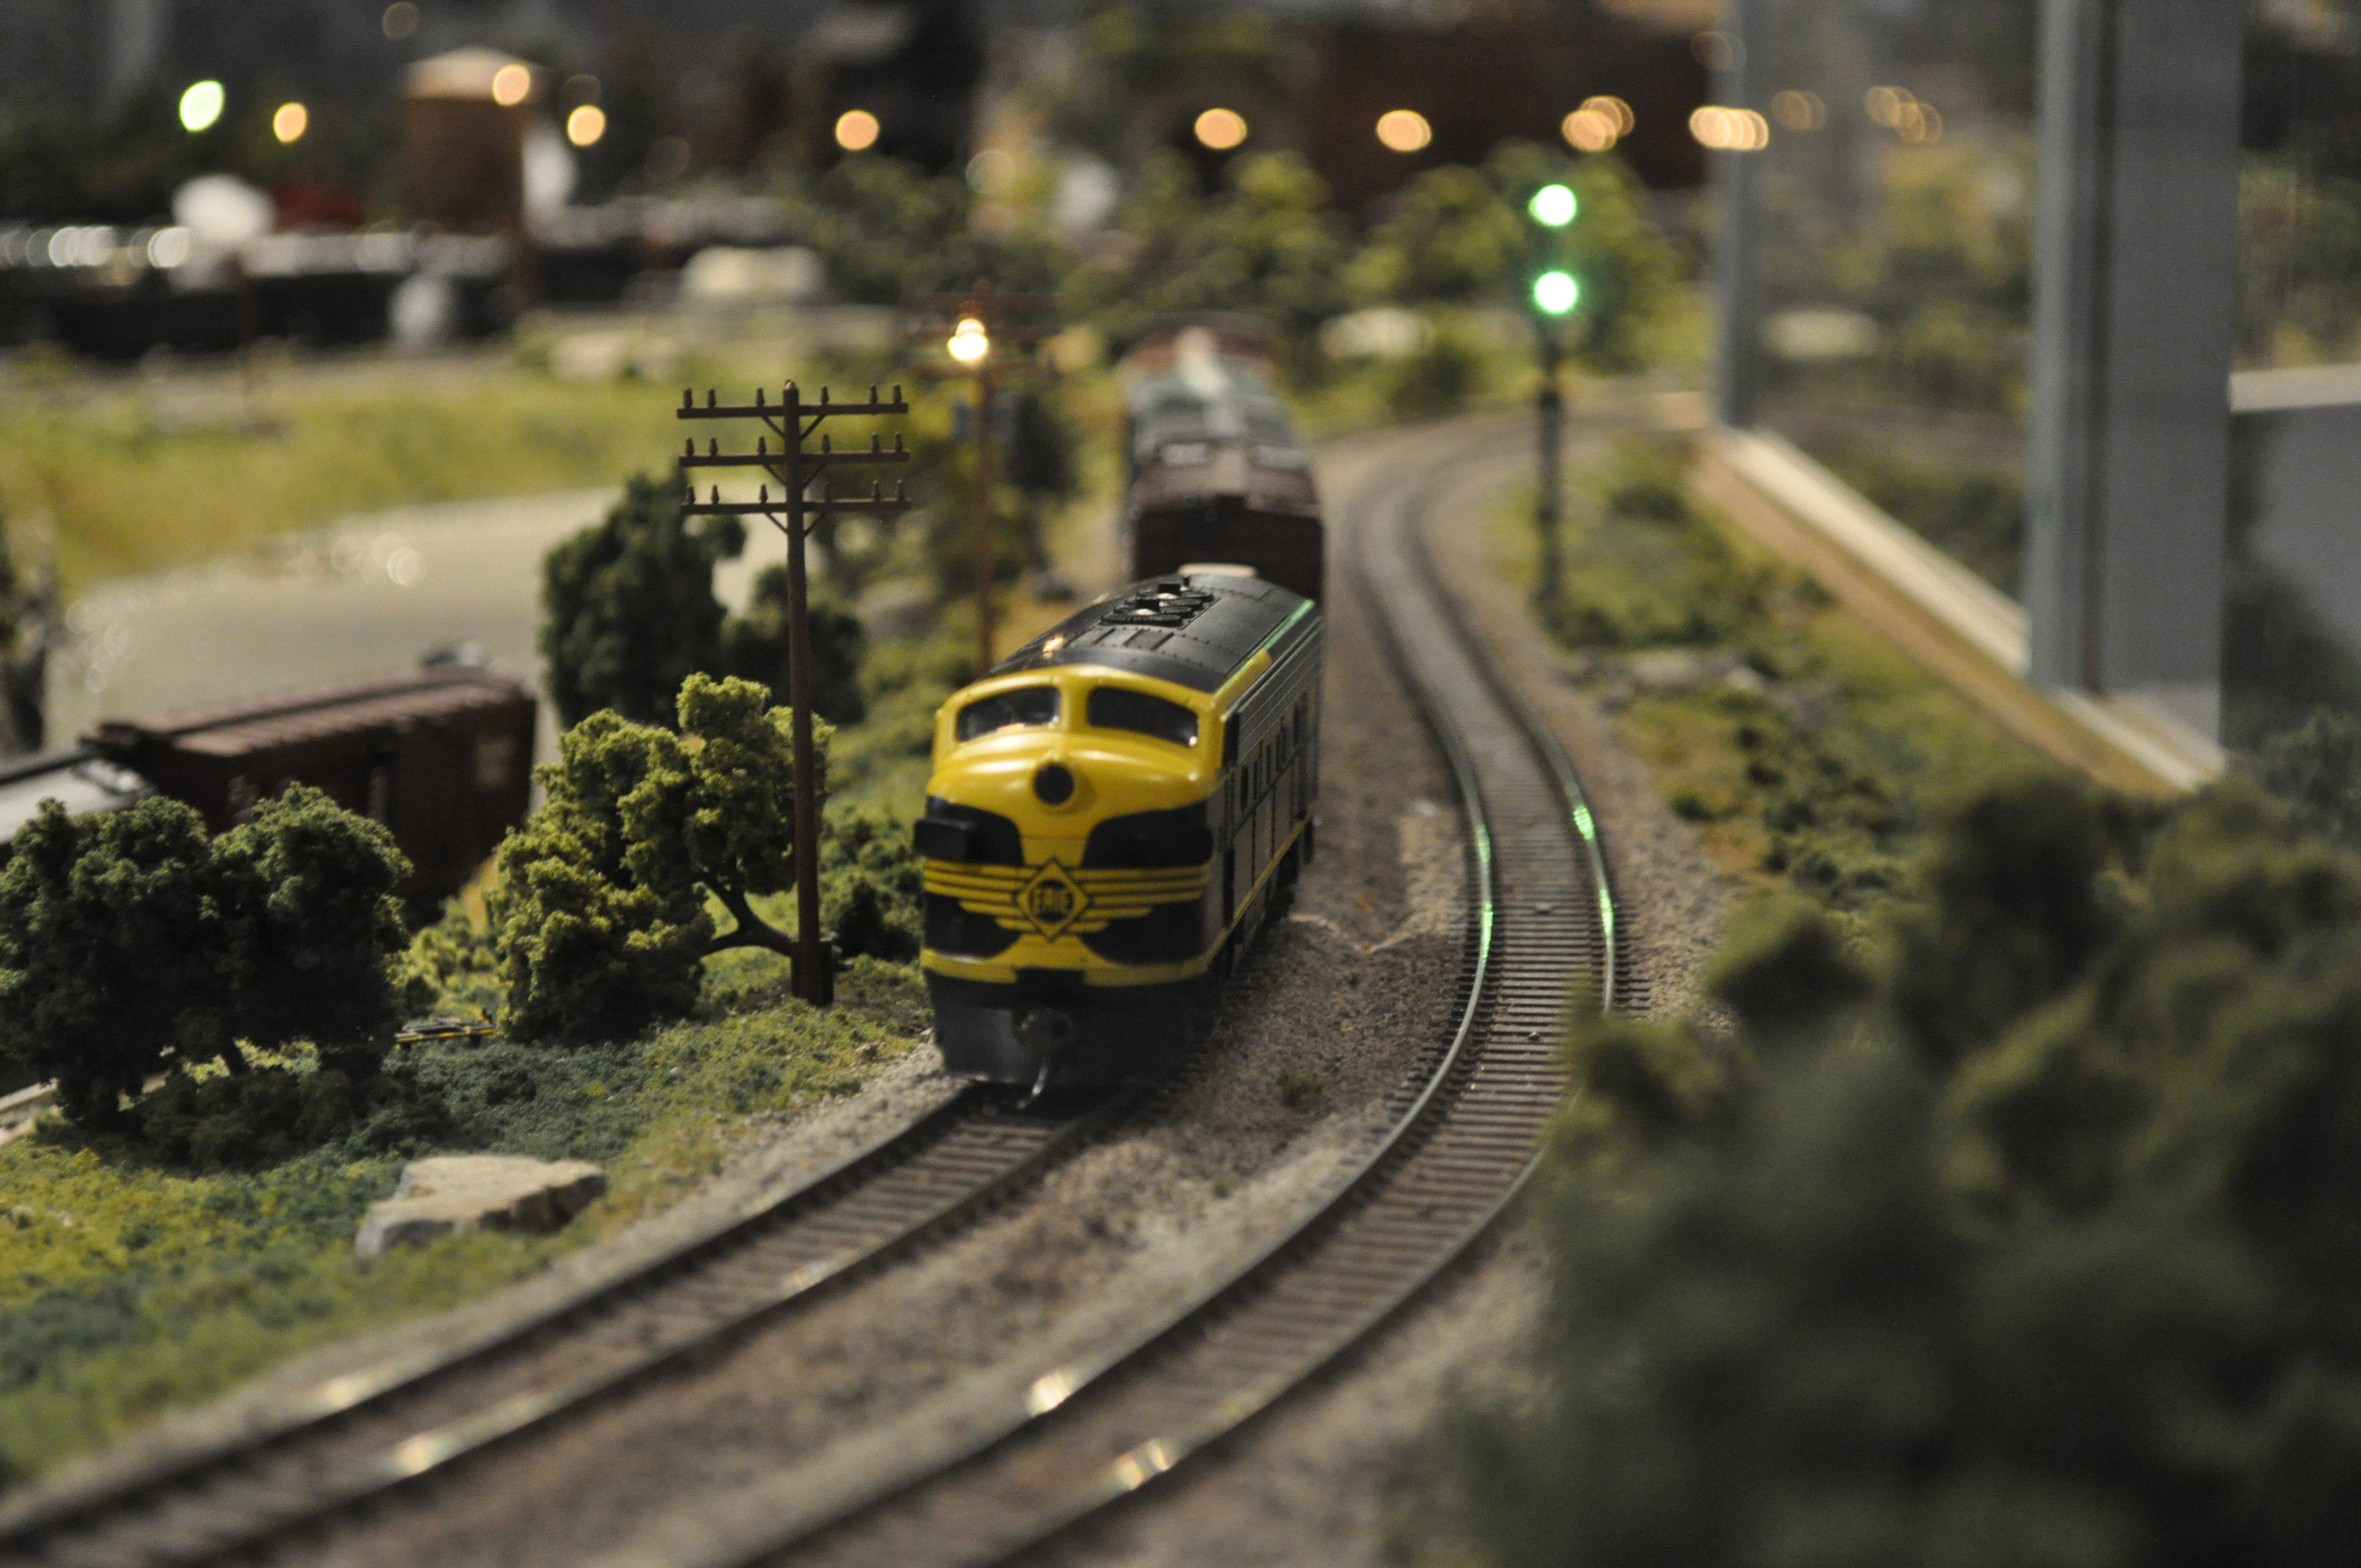 Tracks For Vehicles >> MODEL-TRAIN train toy model railroad minature trains tracks wallpaper | 4288x2848 | 417679 ...